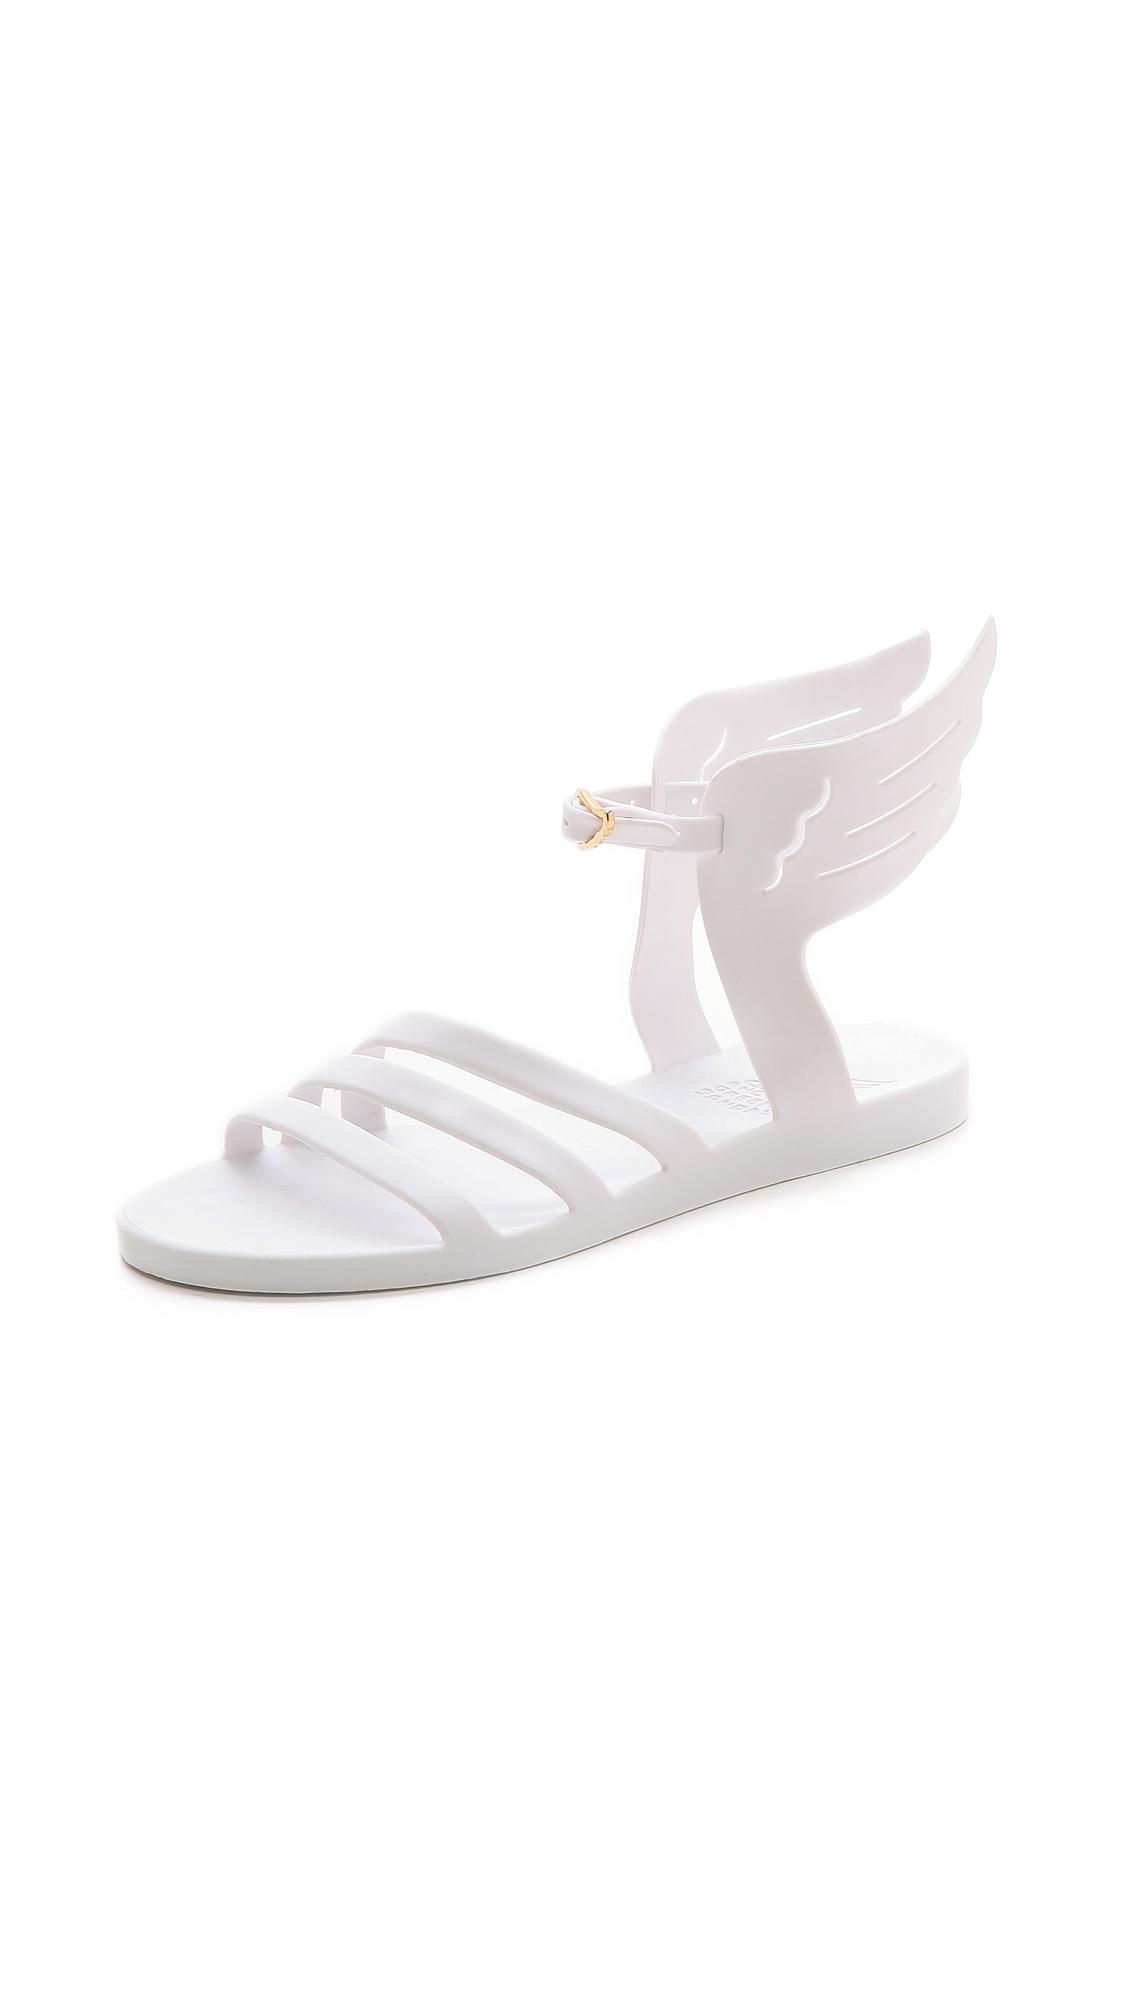 Ikaria JellyShopbop Greek Sandals Wing Ancient bf6gyY7